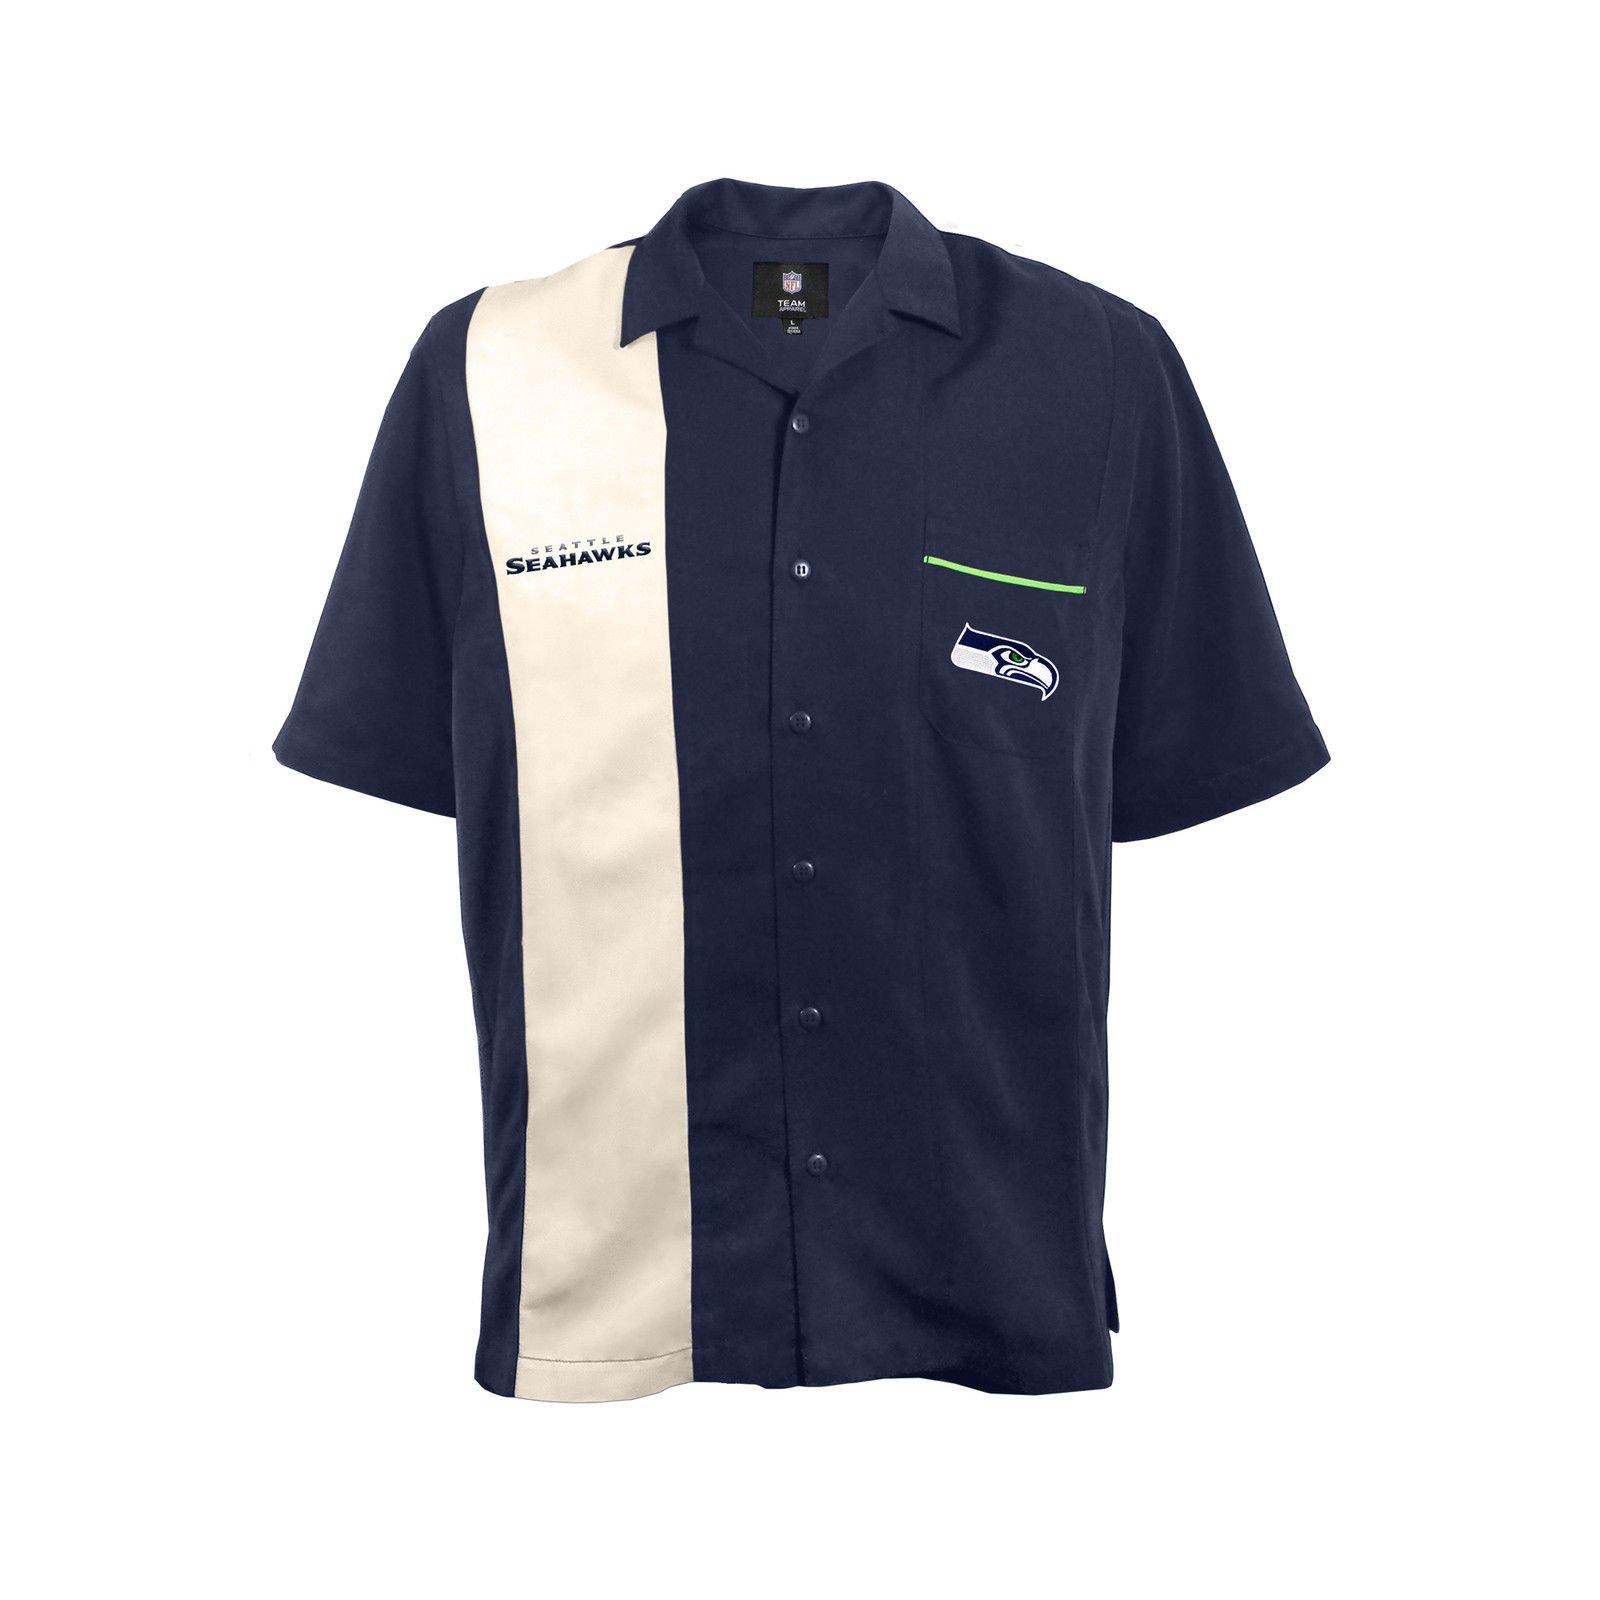 NFL Seattle Seahawks Strike Bowling Shirt, Medium by Littlearth